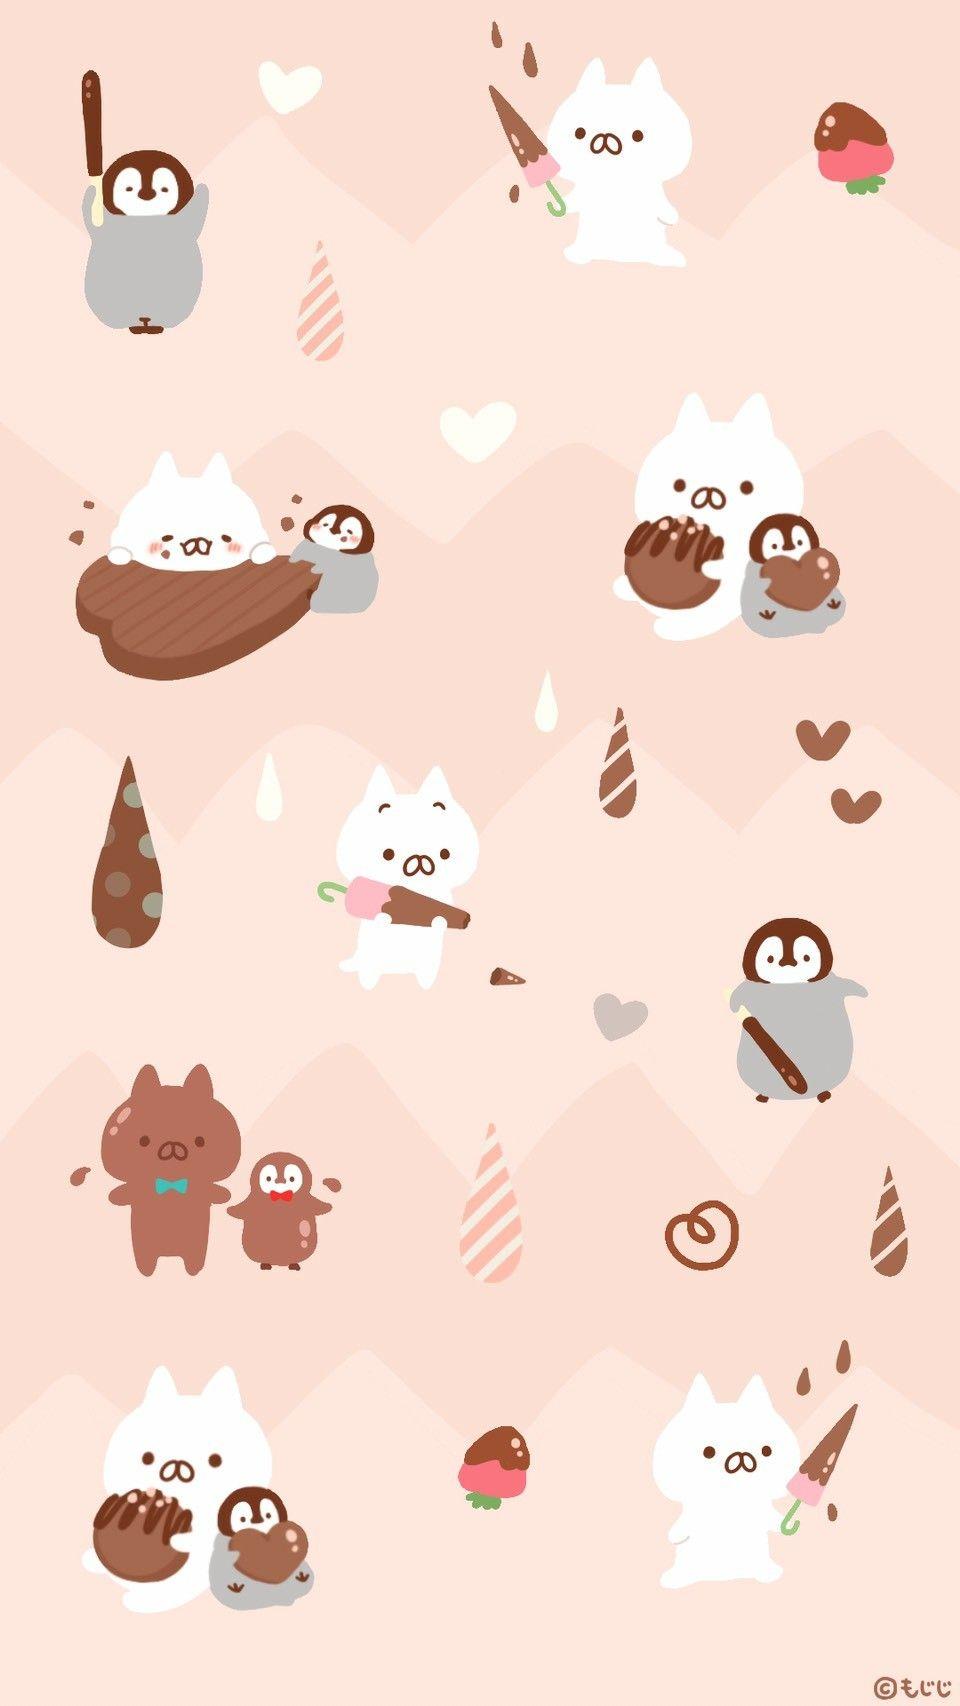 Onigiriのnekoとnoriのpenguin うさまる 壁紙 猫 イラスト かわいい